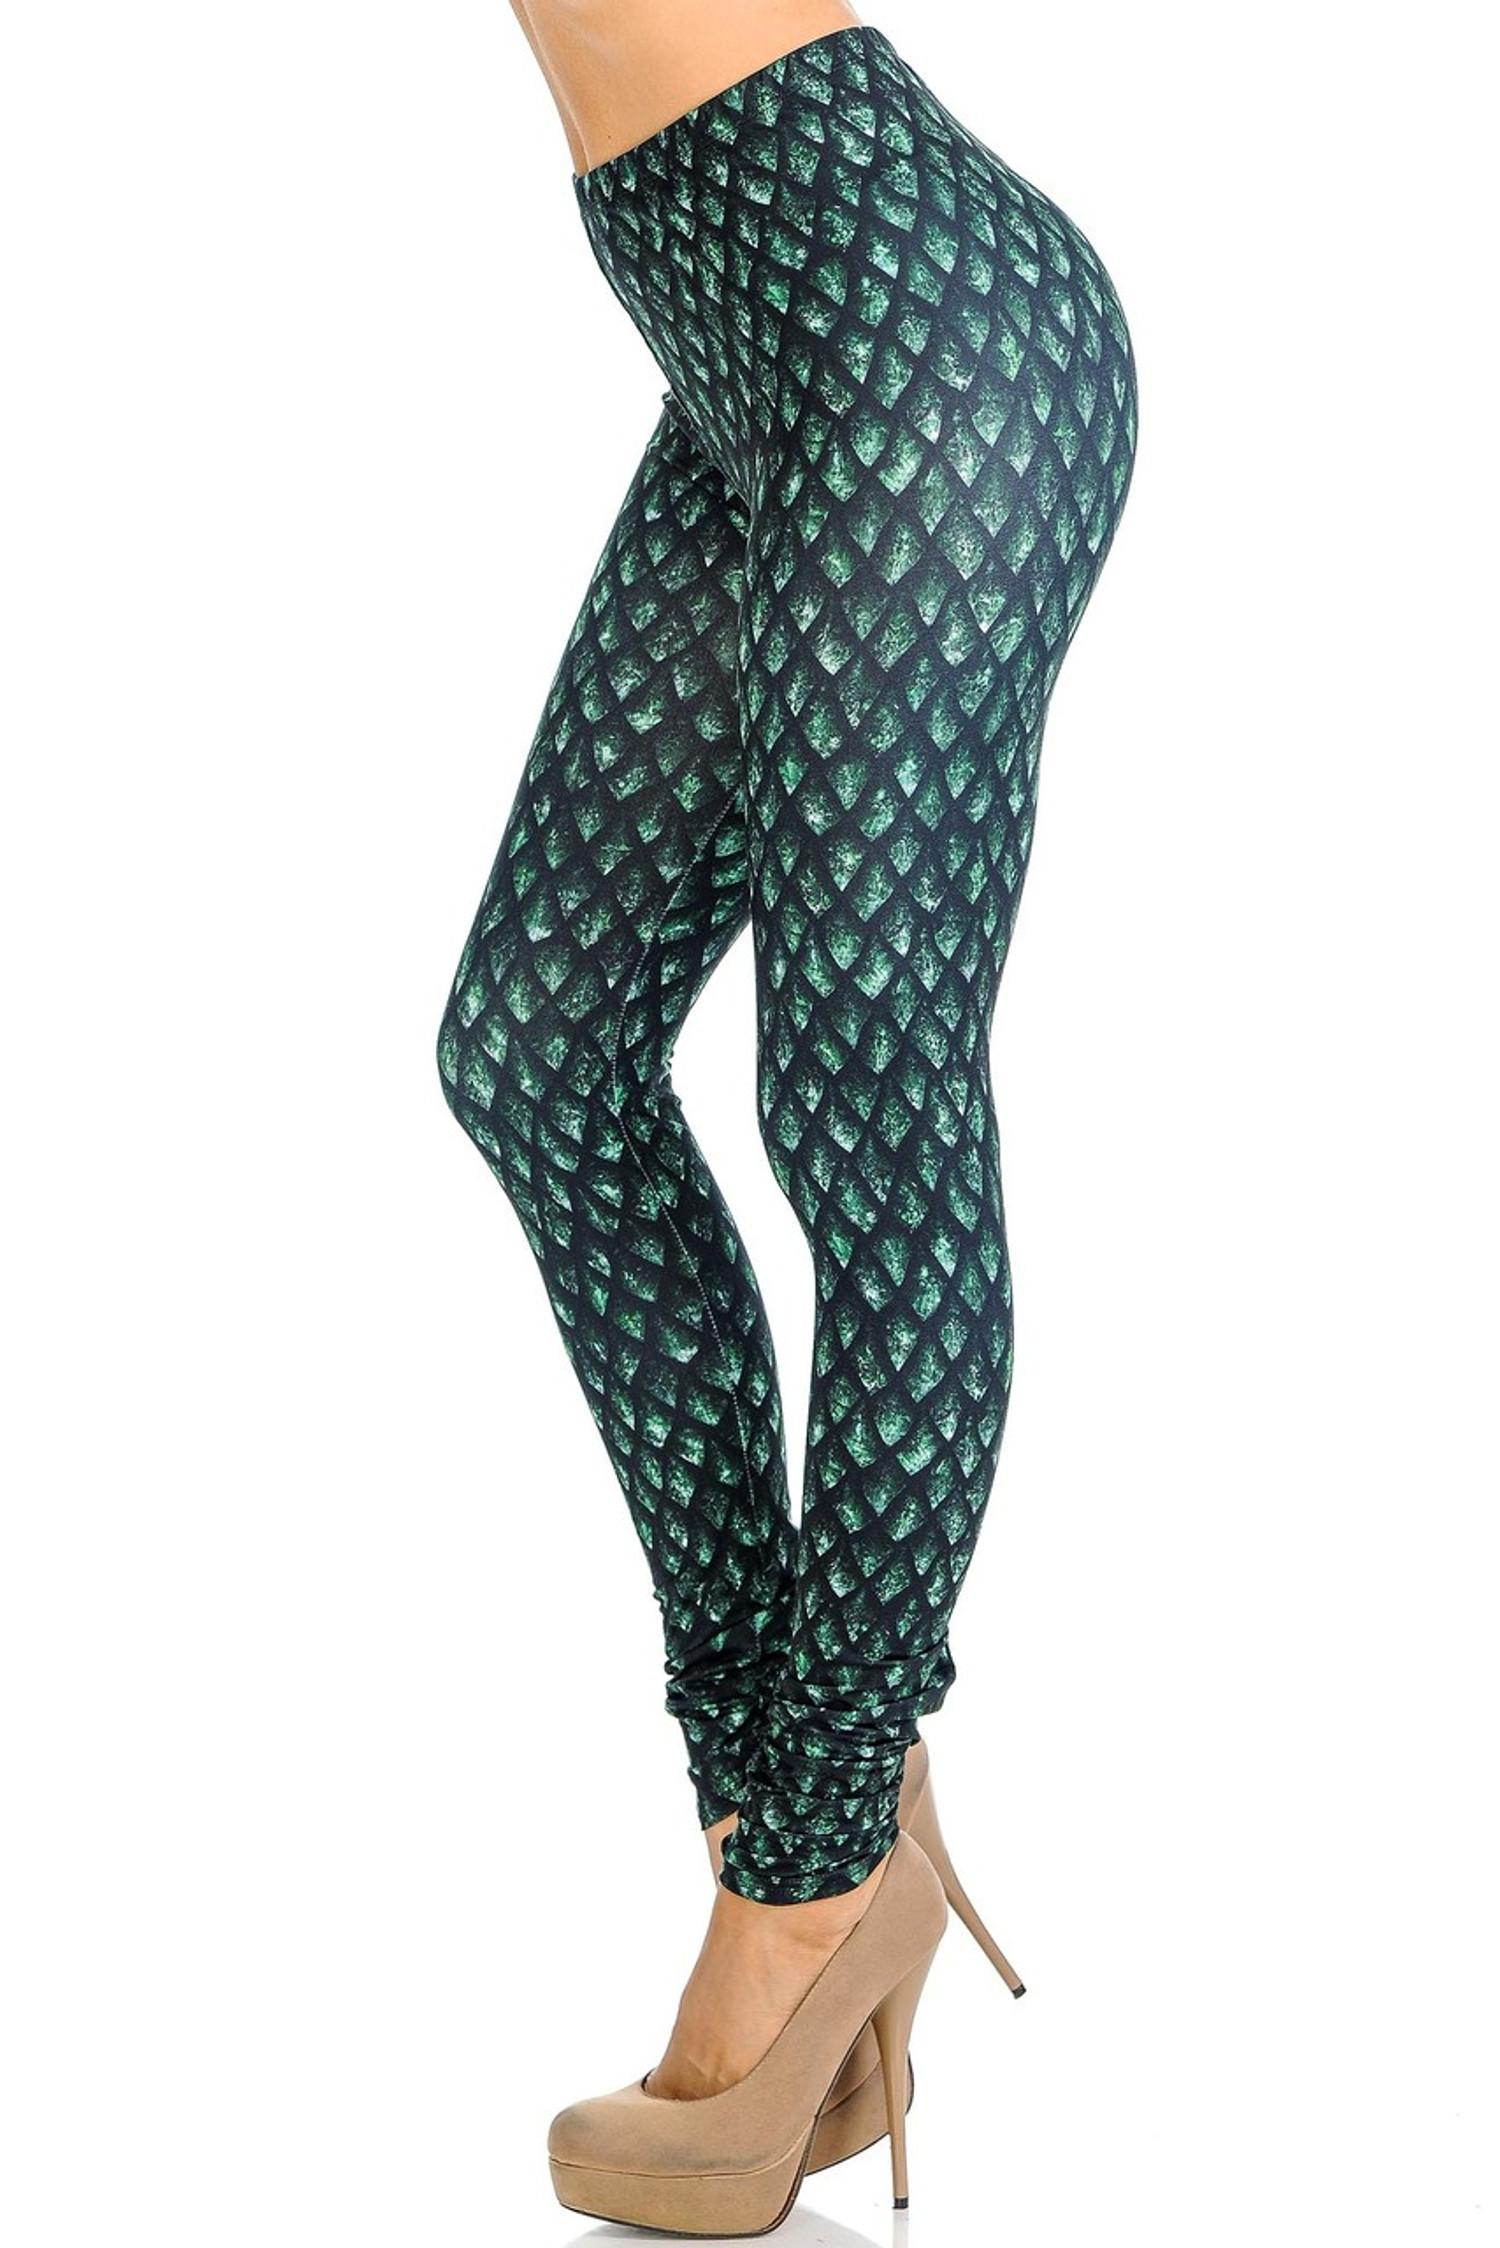 Creamy Soft Green Dragon Scale Leggings - Signature Collection